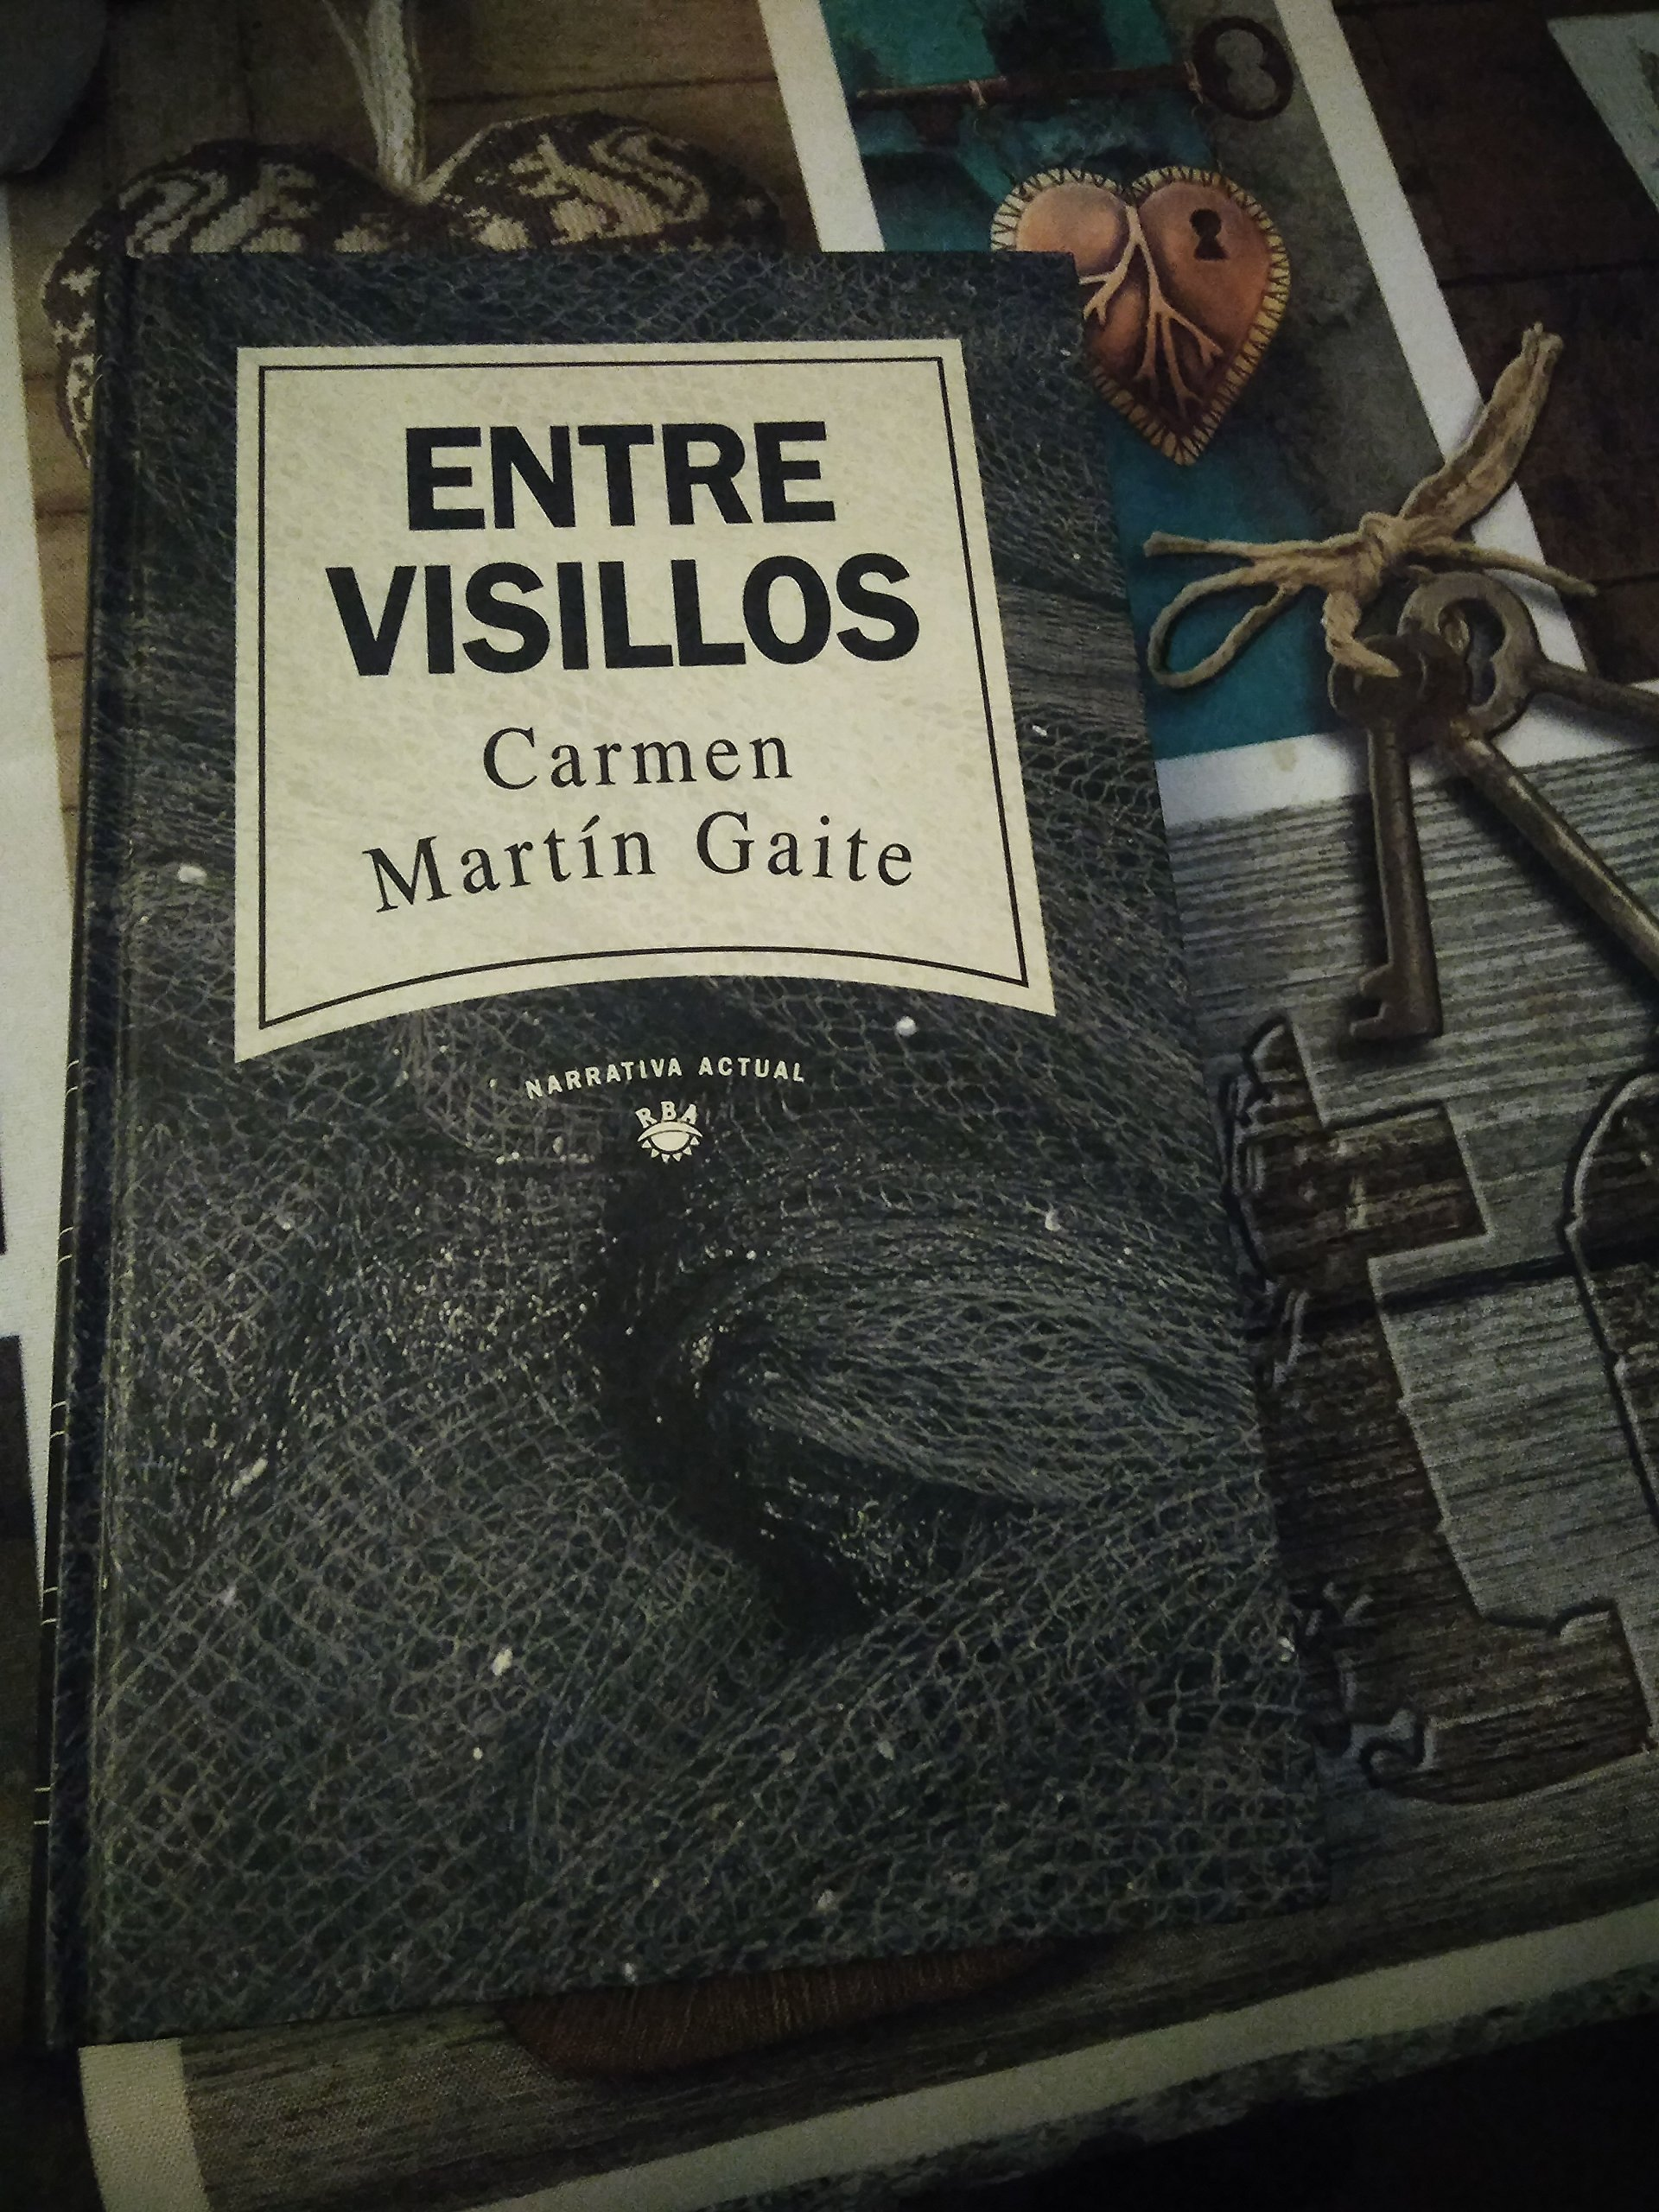 ENTRE VISILLOS.: Amazon.es: MARTIN GAITE, CARMEN:: Libros